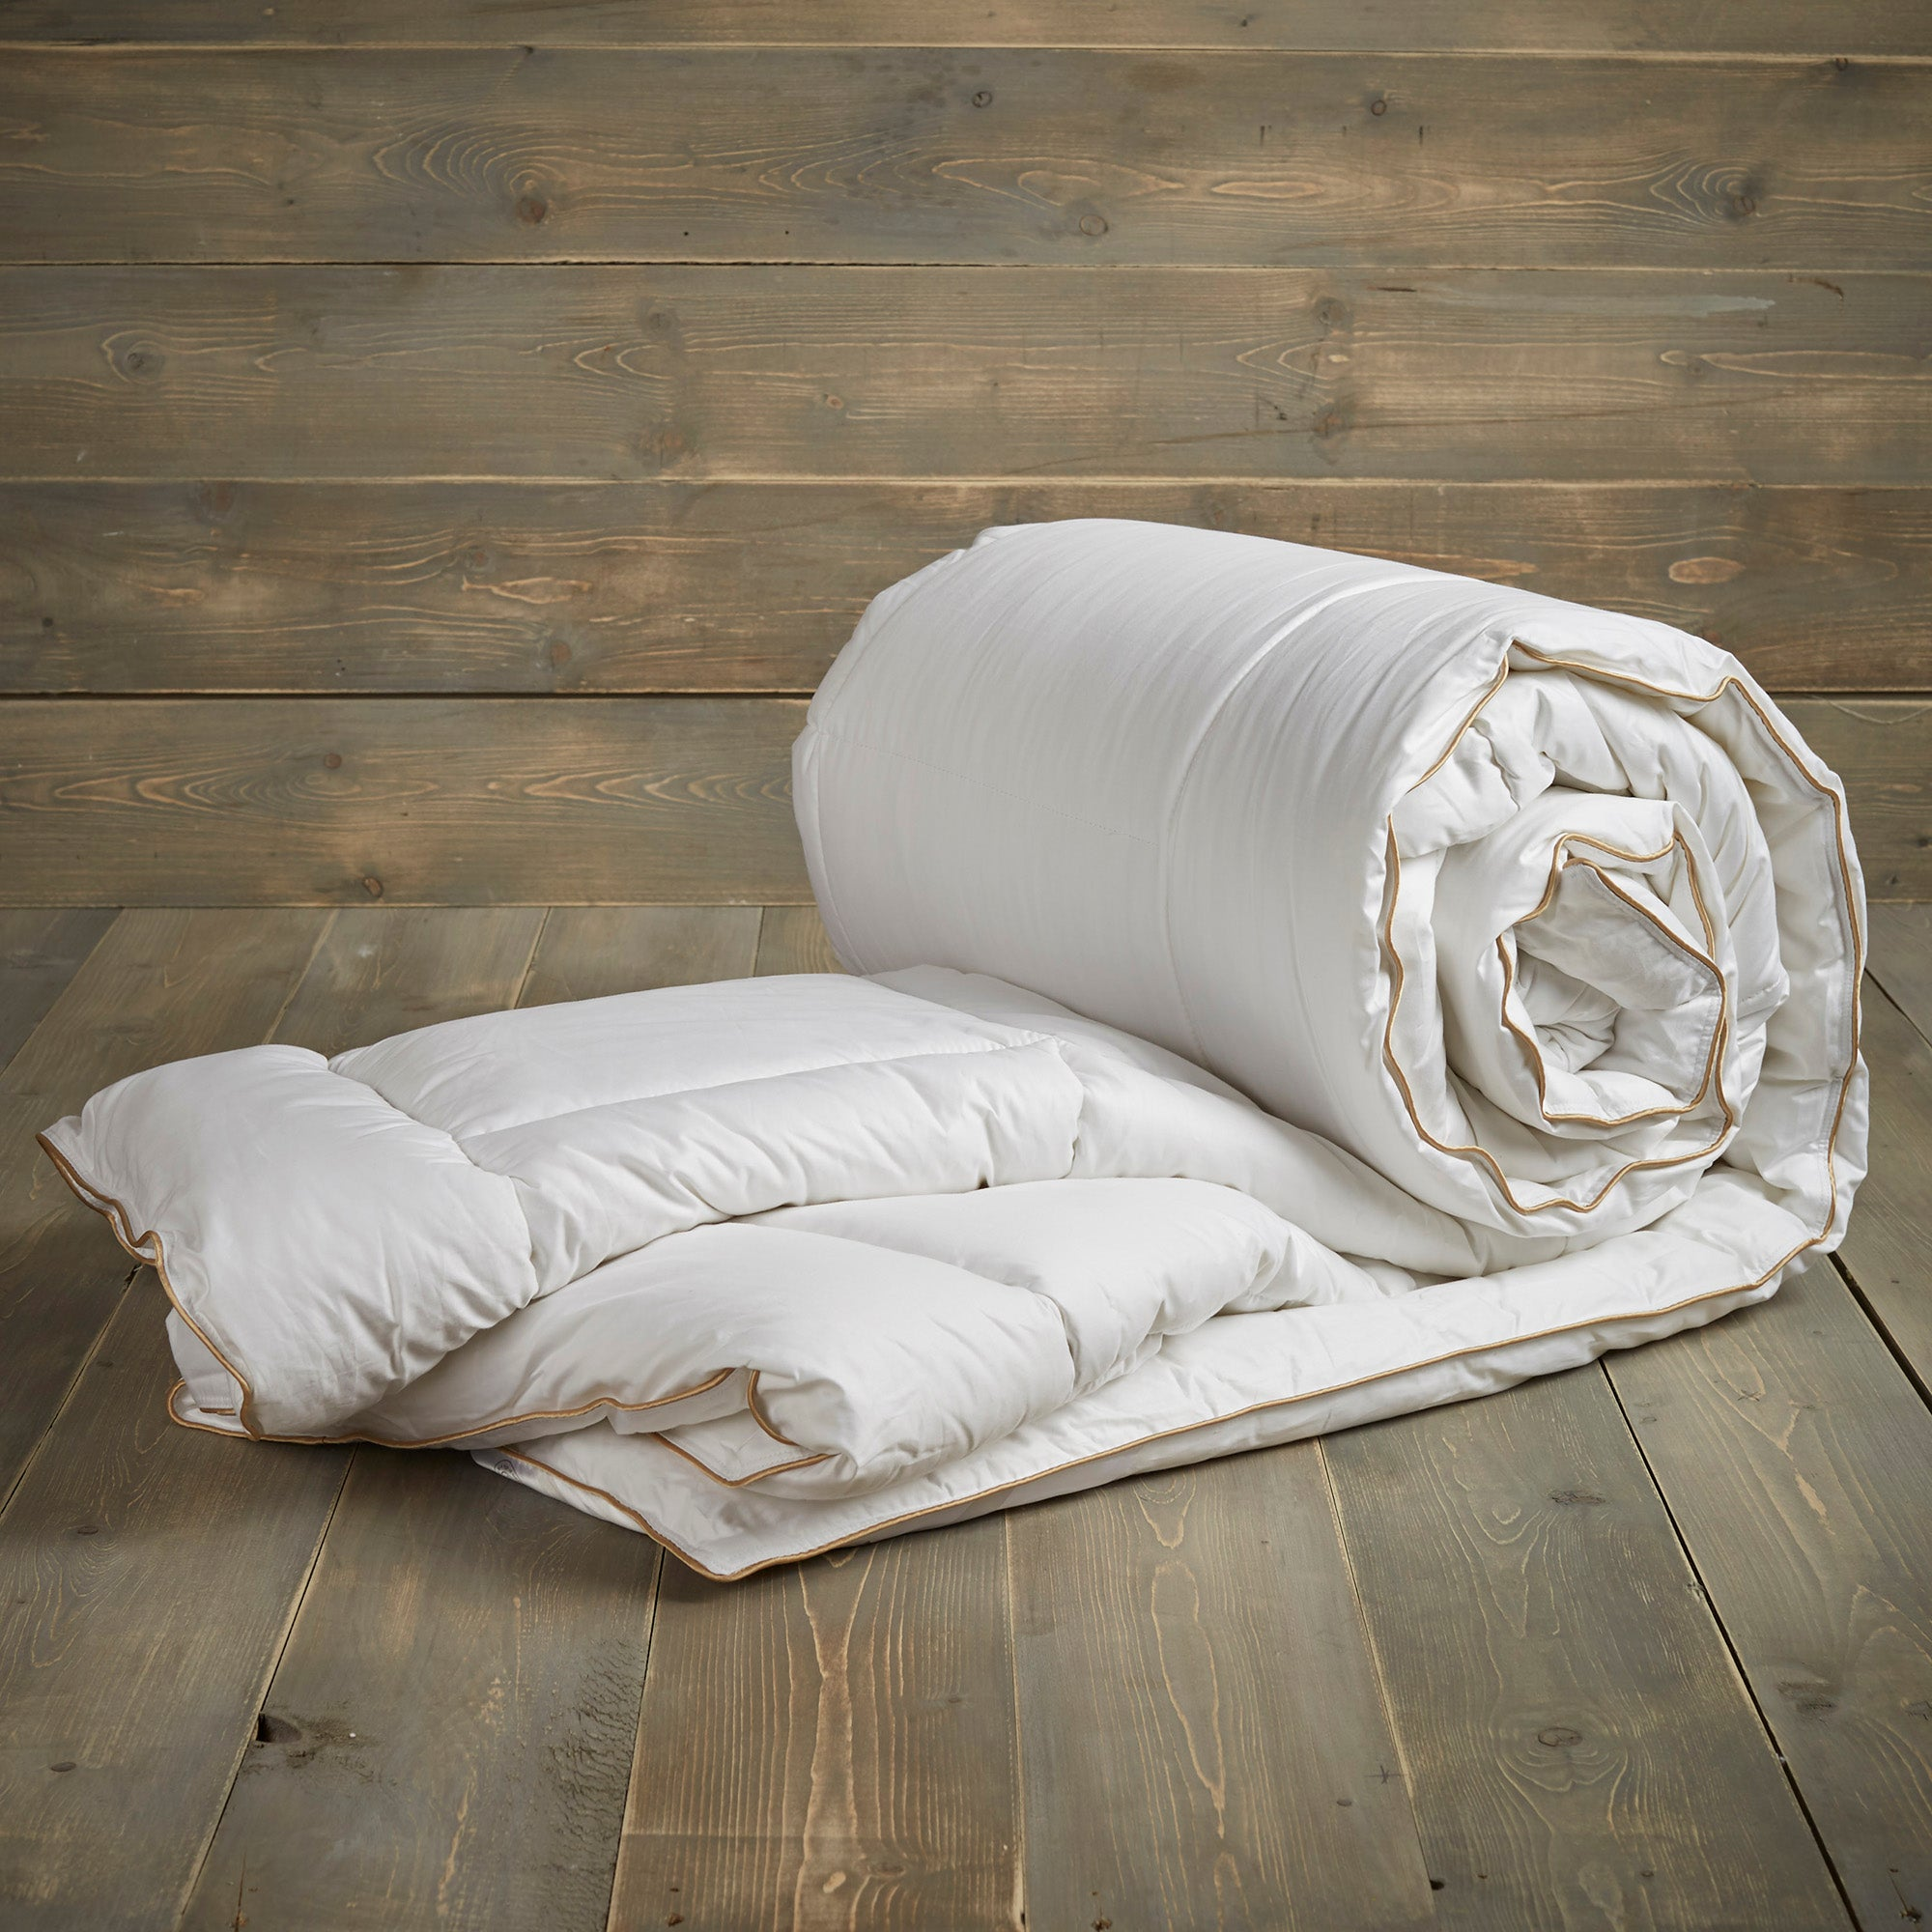 Image of Dorma Luxurious Silk 10.5 Tog Duvet White